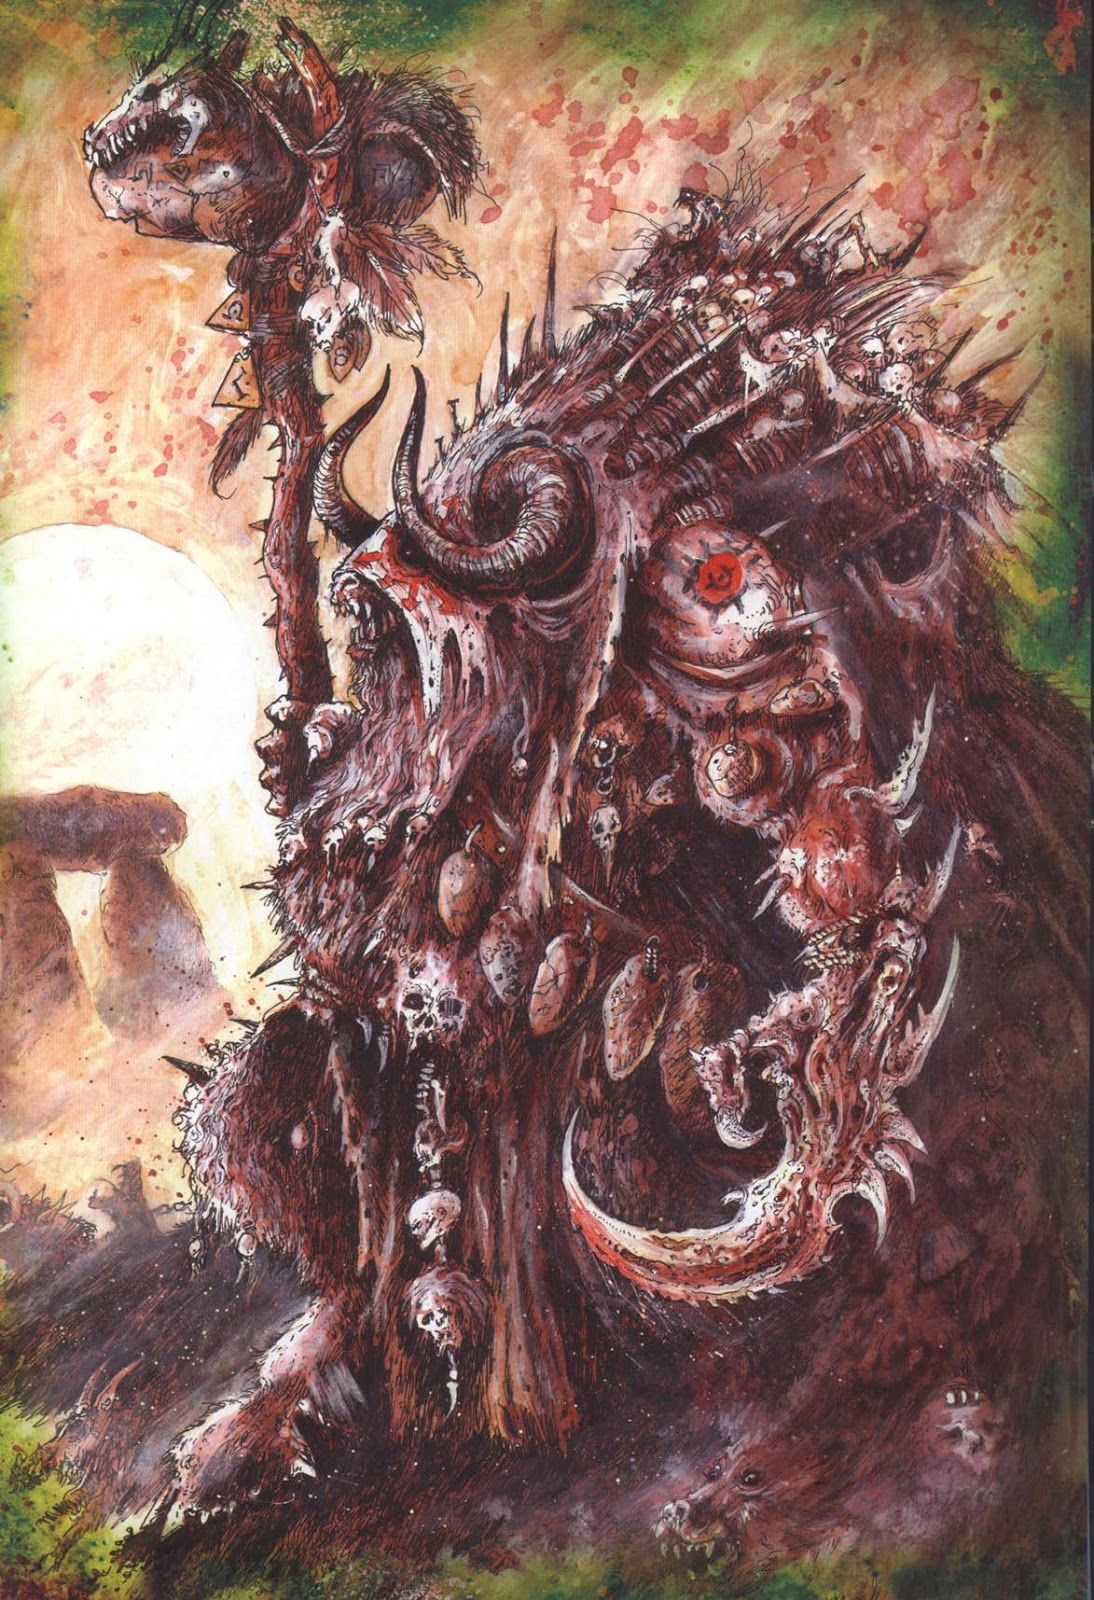 Morghur, par John Blanche #WarhammerBattle #GamesWorkshop   Warhammer  fantasy, Warhammer art, Warhammer fantasy battle